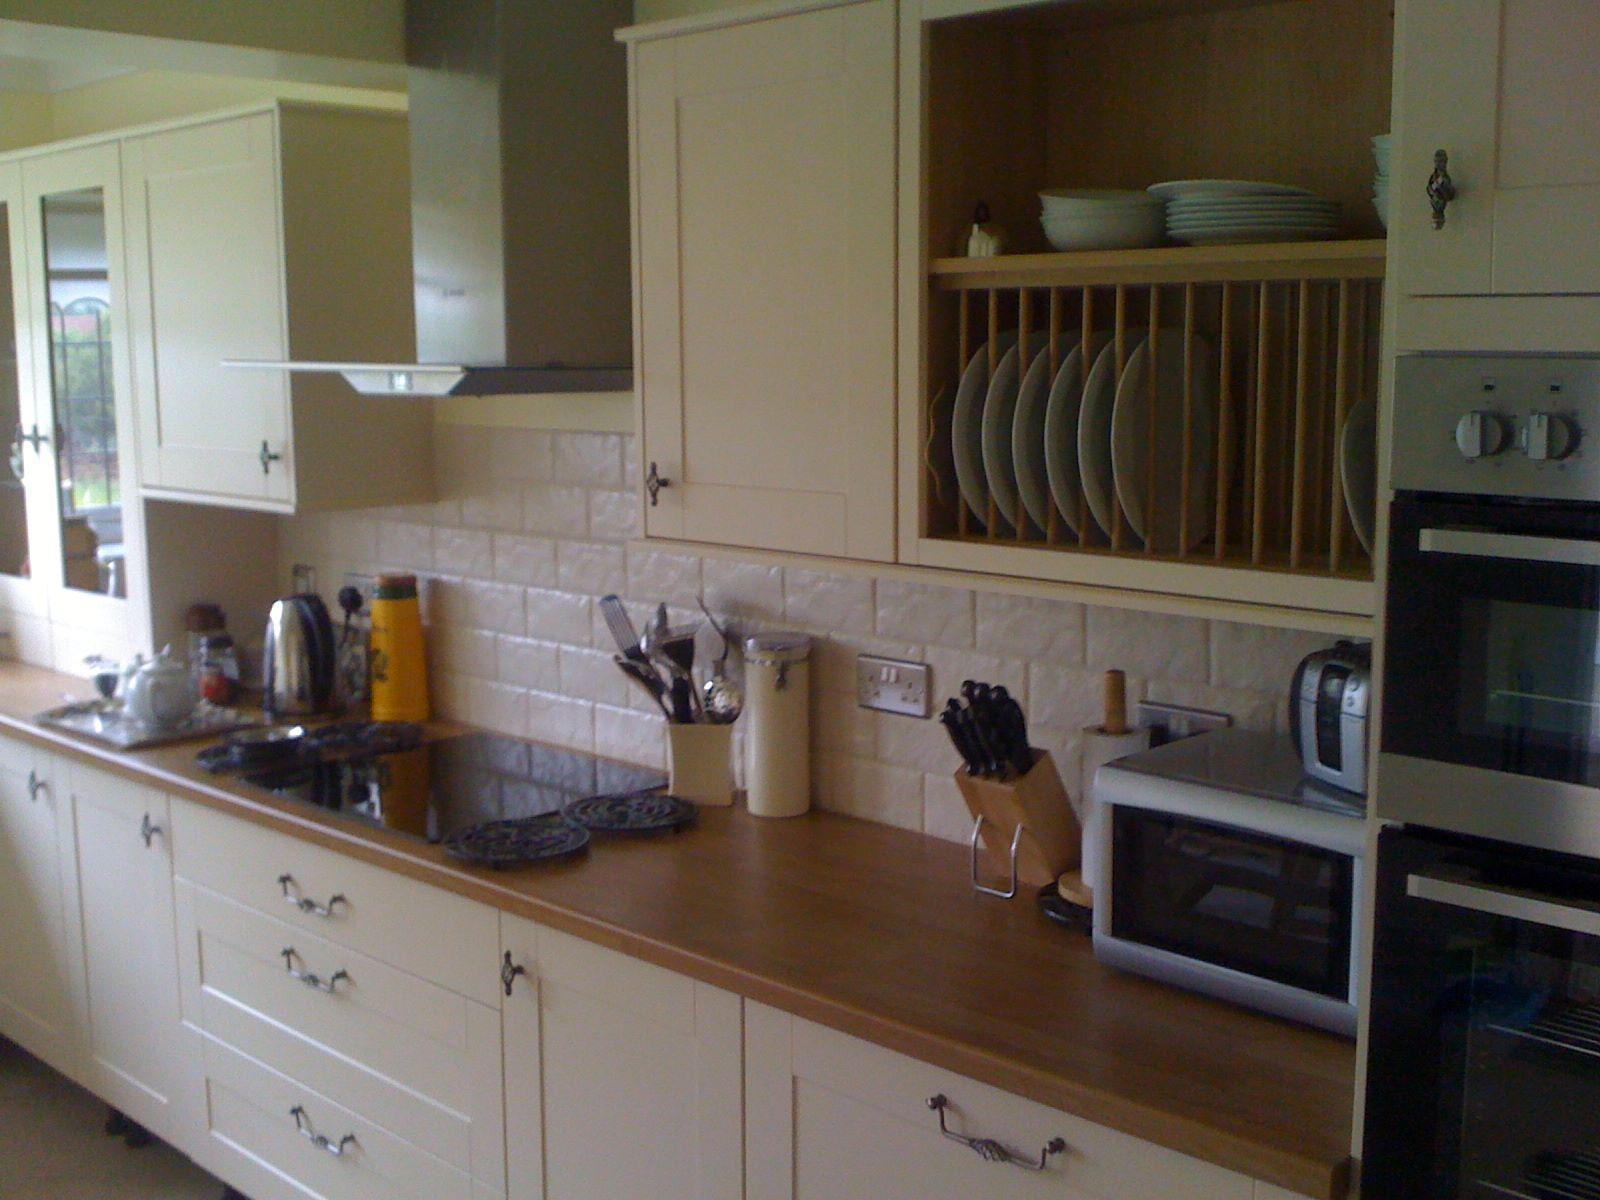 Uncategorized Howdens Kitchen Appliances Price essex howdens kitchen j a pell son kitchen